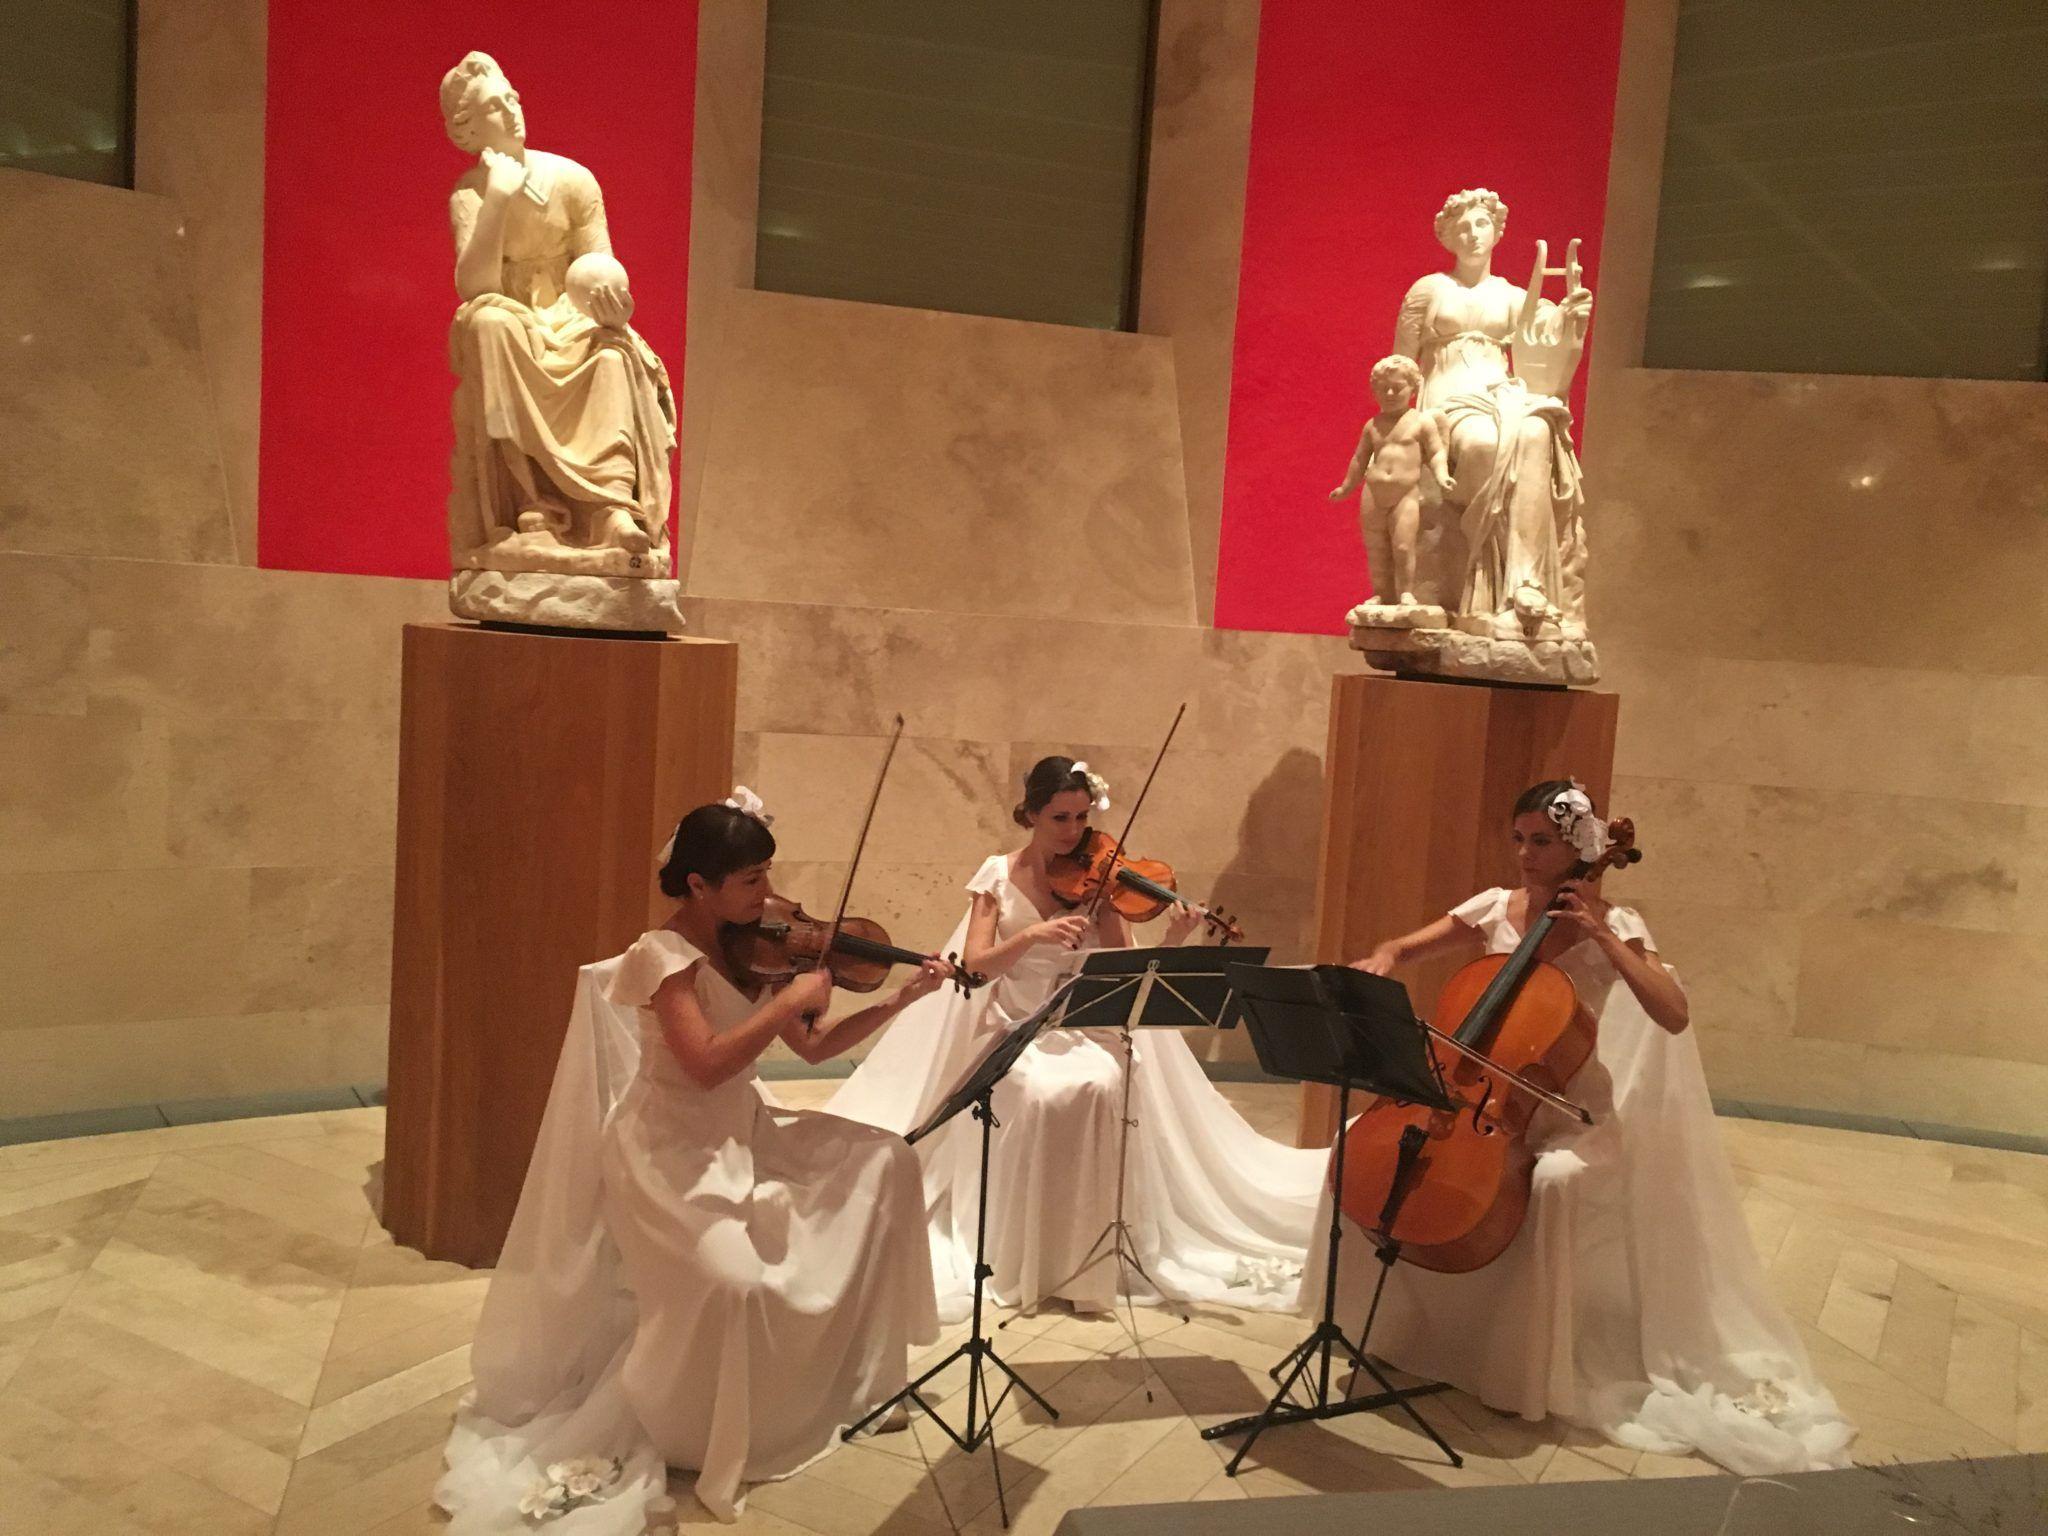 Dancem's string trio at the Prado Museum